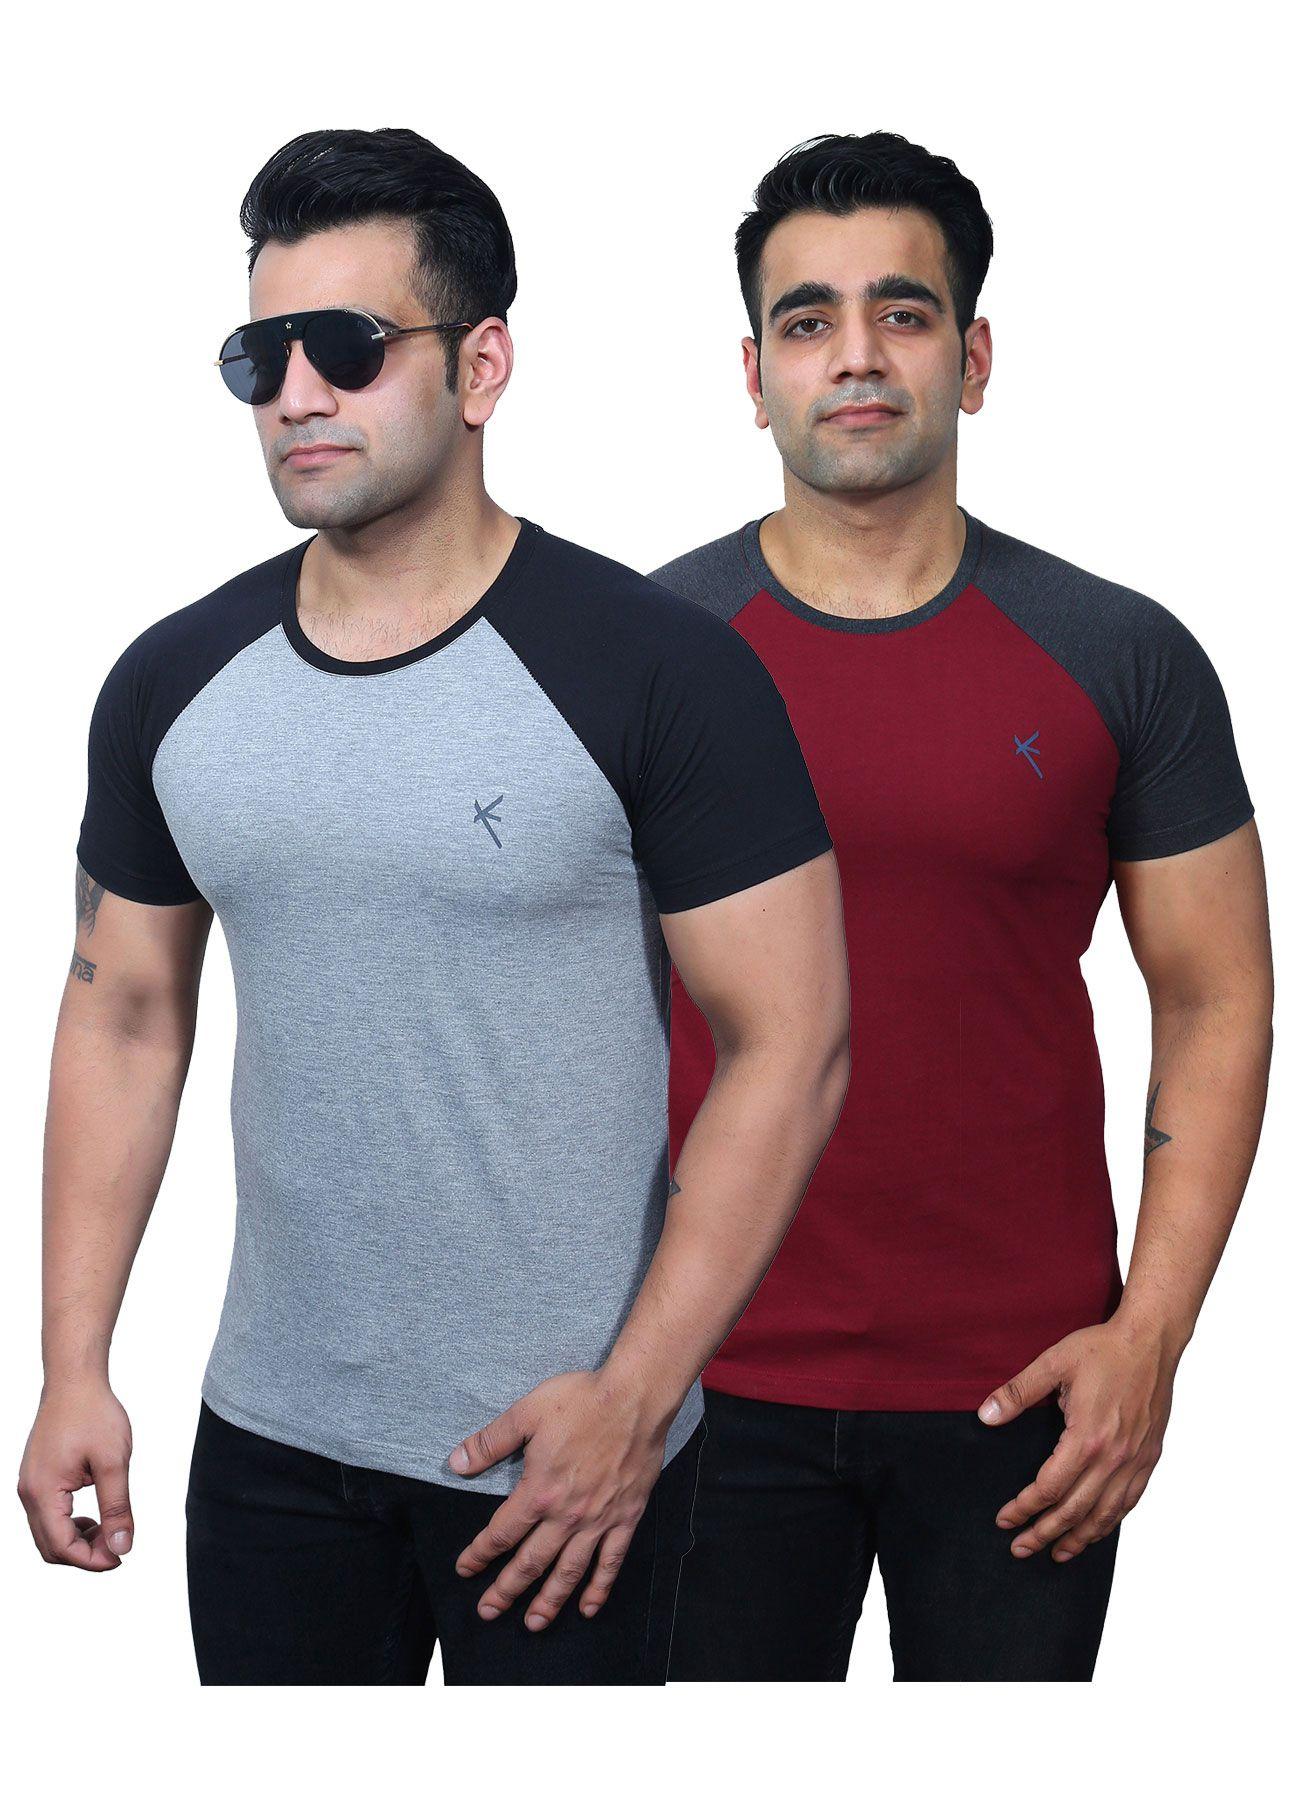 Yross Off-White Round T-Shirt Pack of 2